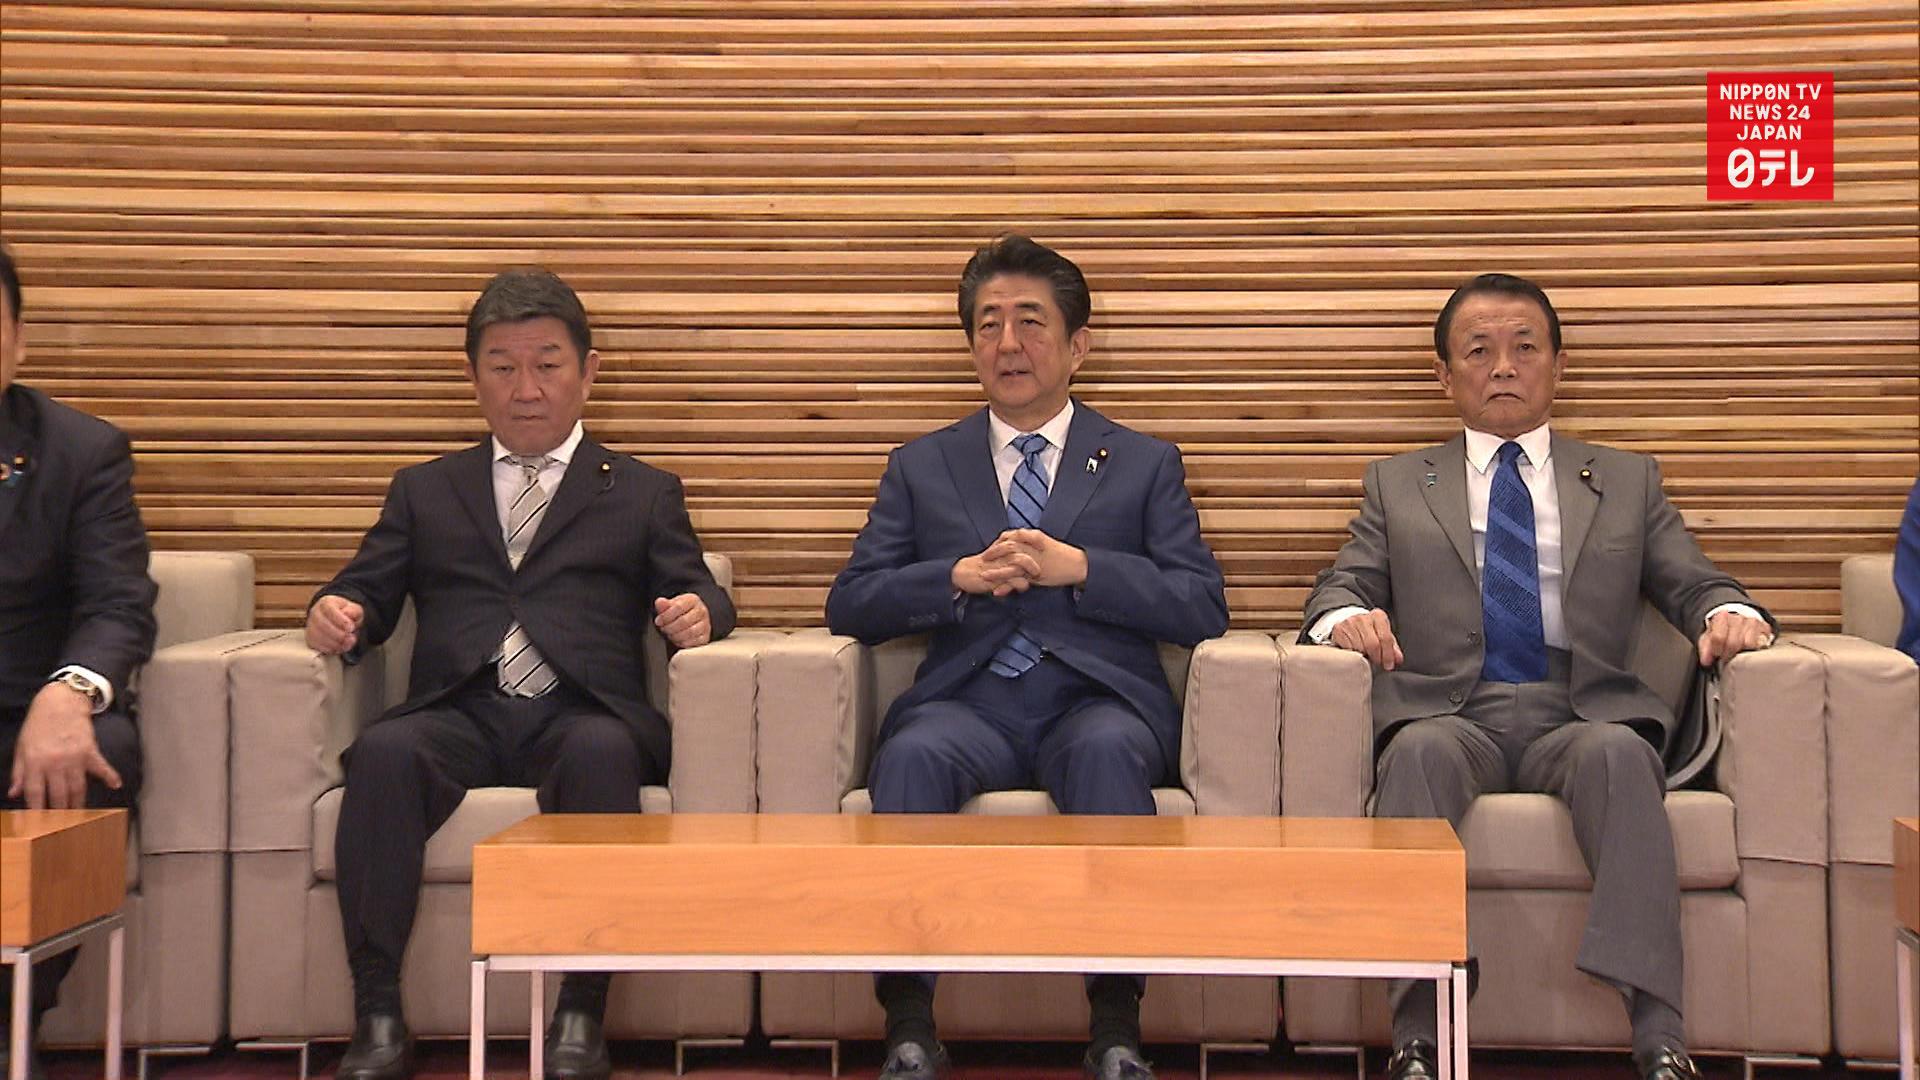 CORONAVIRUS: Japan moves up prevention ordinance